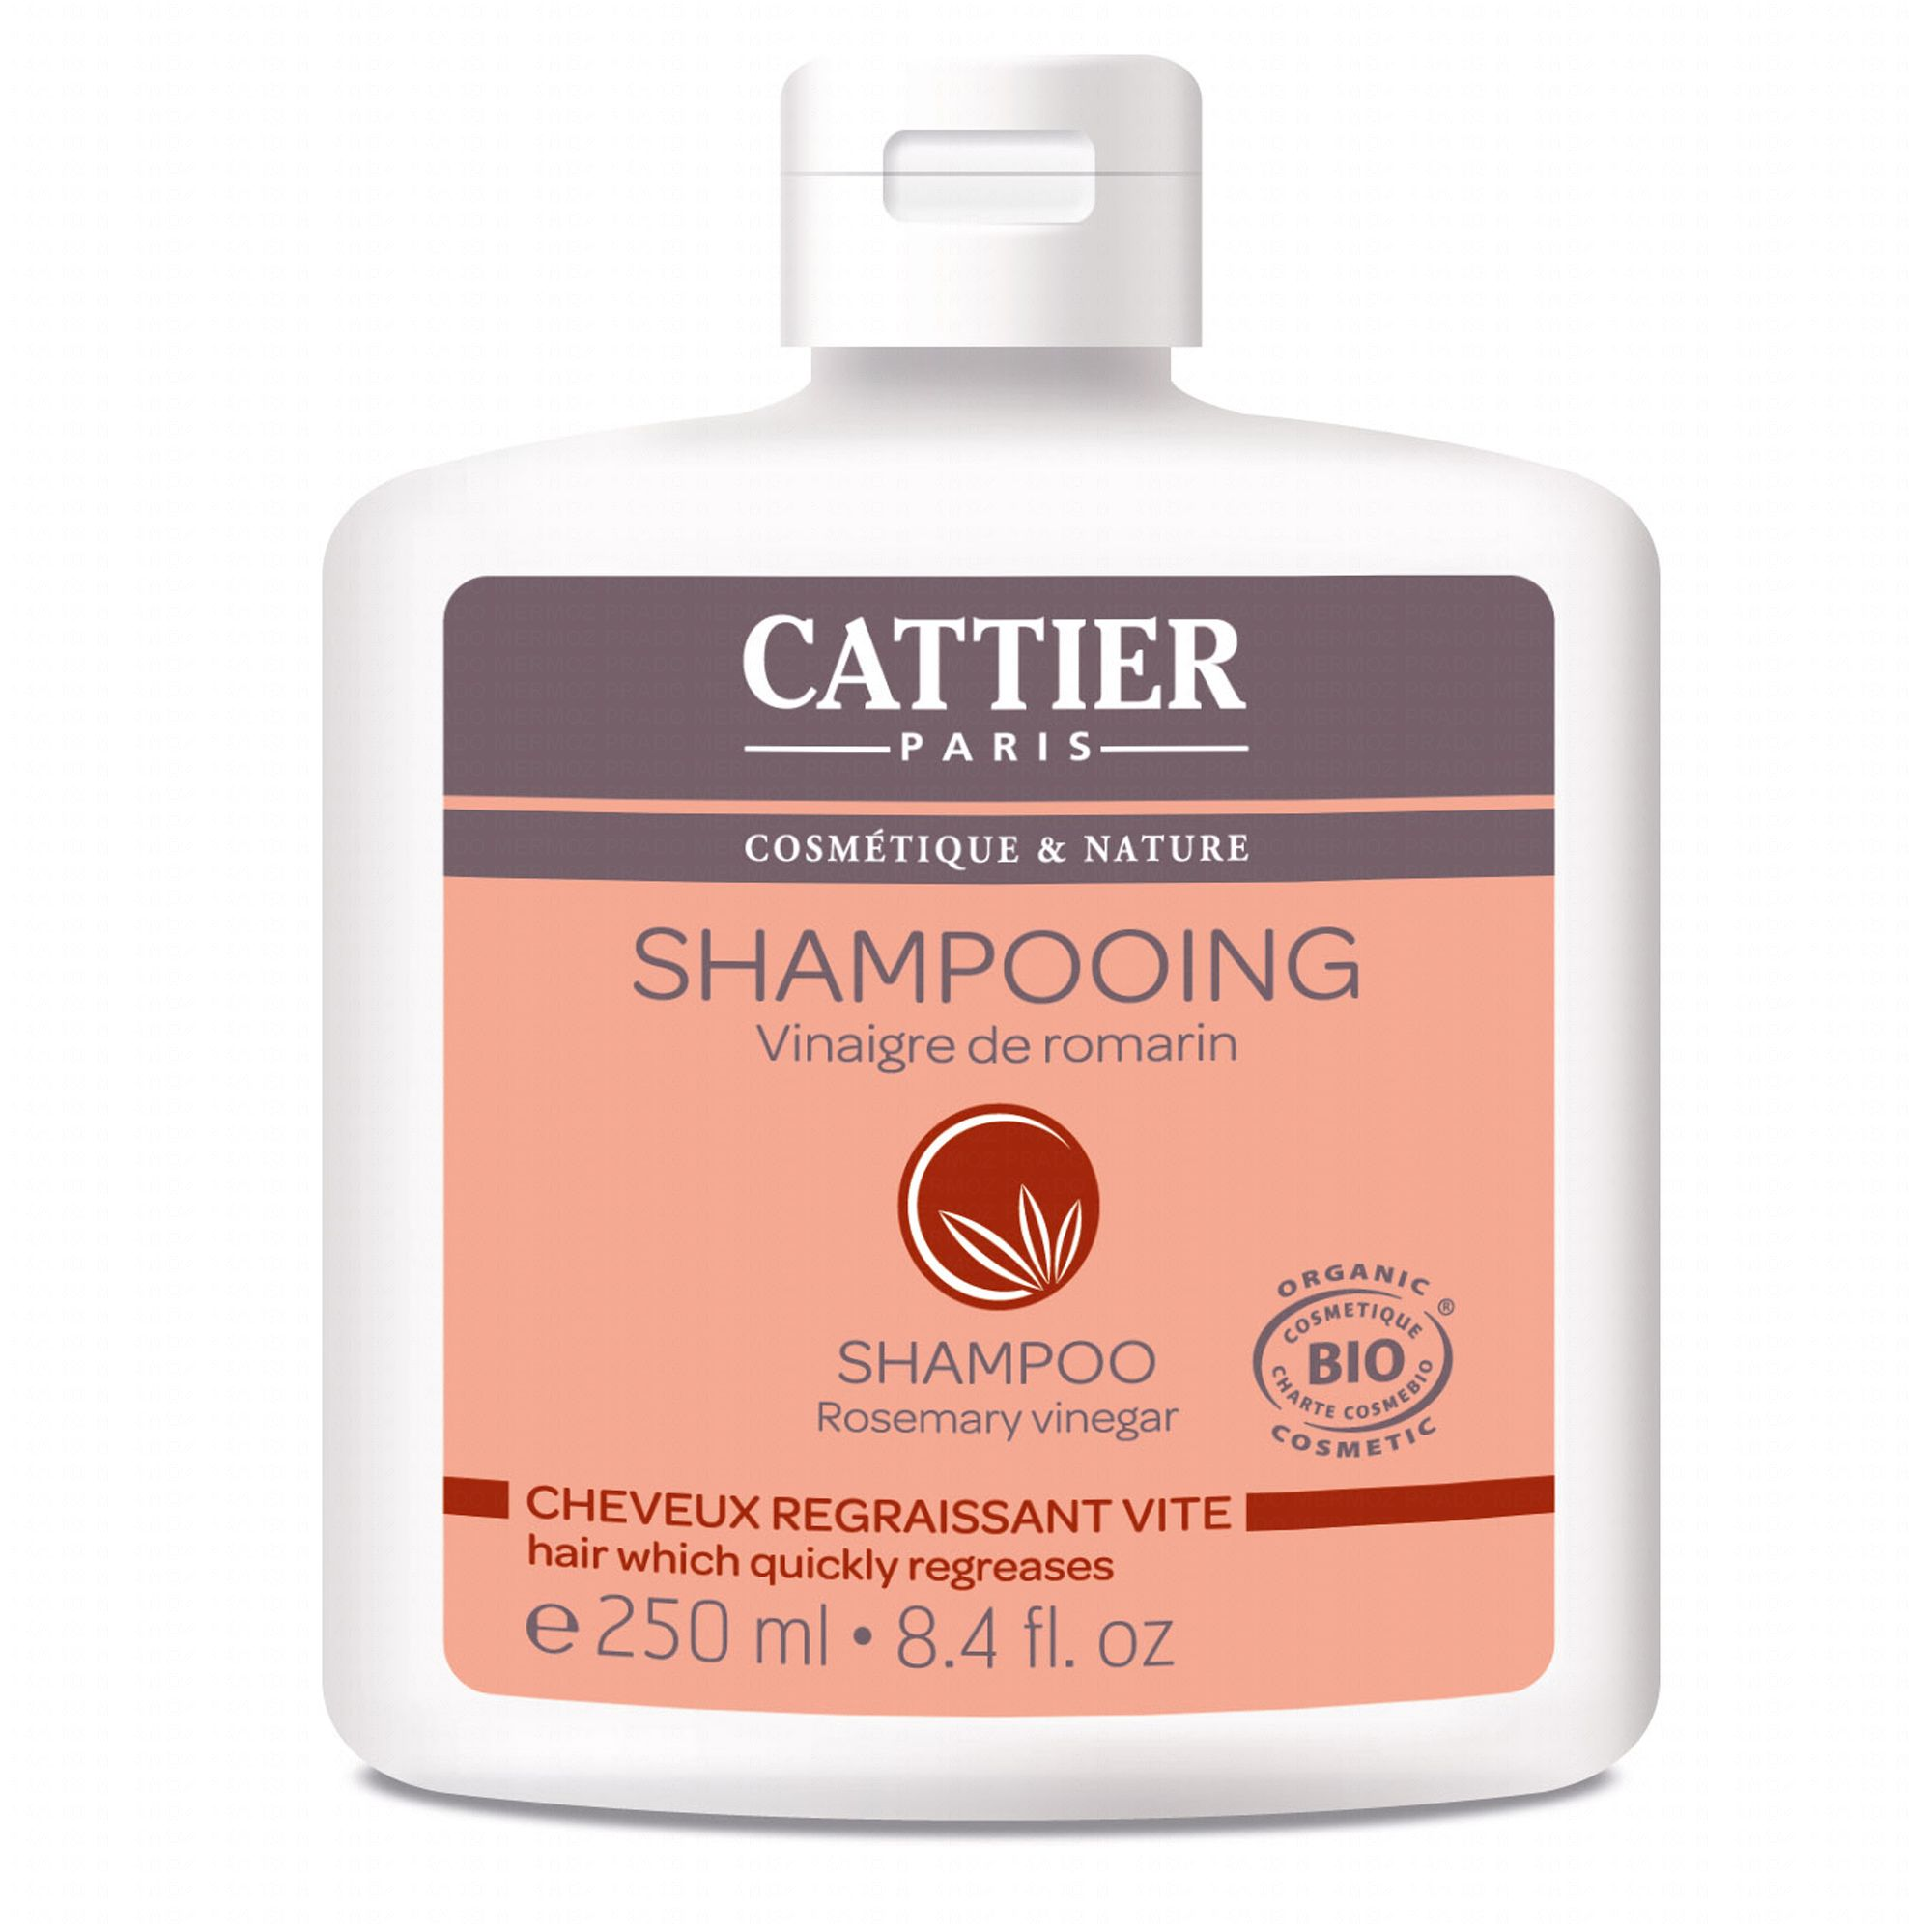 cattier shampooing vinaigre de romarin cheveux gras bio - Shampoing Bio Cheveux Colors